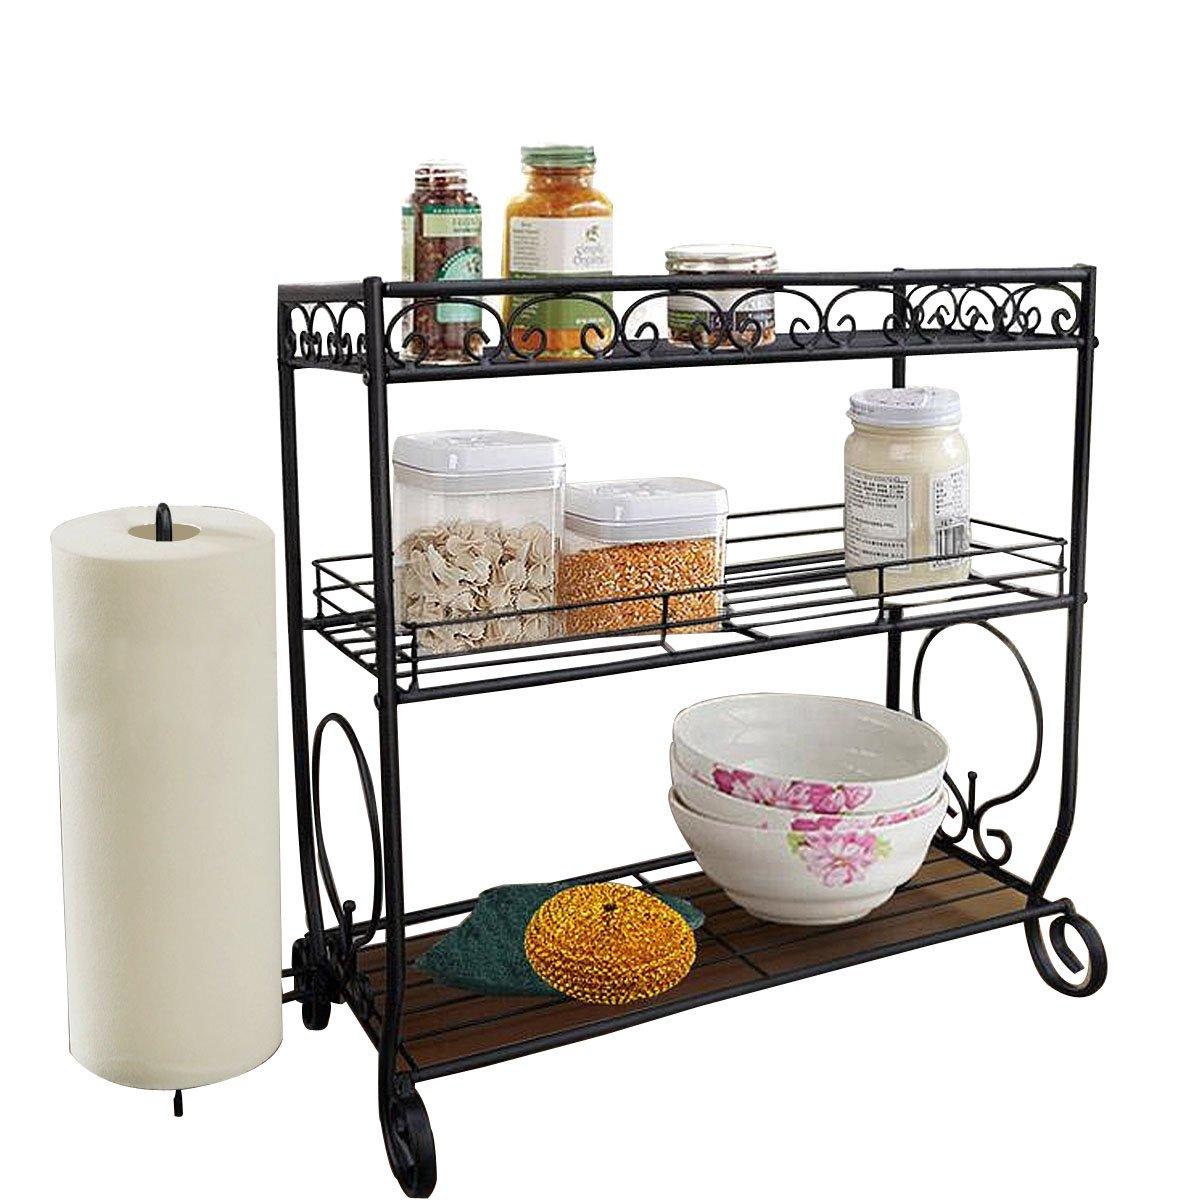 VANRA 3 Tier Spice Rack Kitchen Spice Stand Holder Jars Storage Organizer Shelf Rack with Tissue Dispenser Rack/Bathroom Paper Towel Holder & Towel Bar (Black) by VANRA